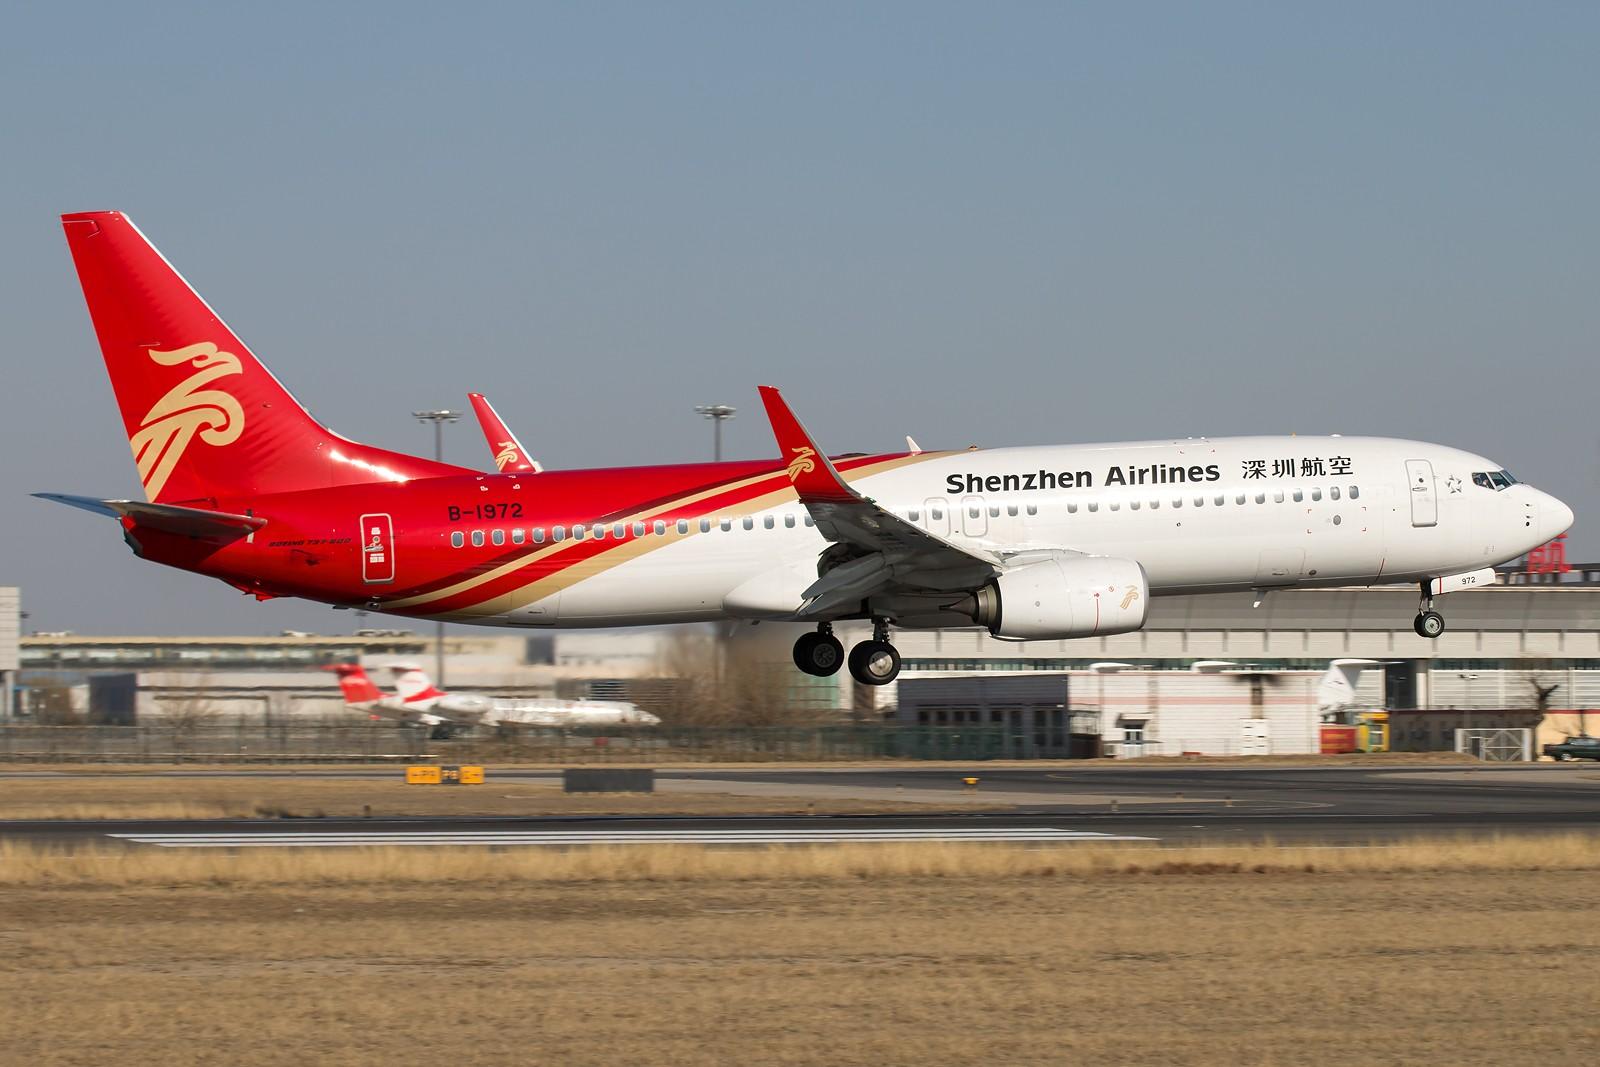 Re:[原创]常规货一组[10pics] BOEING 737-800 B-1972 中国北京首都国际机场